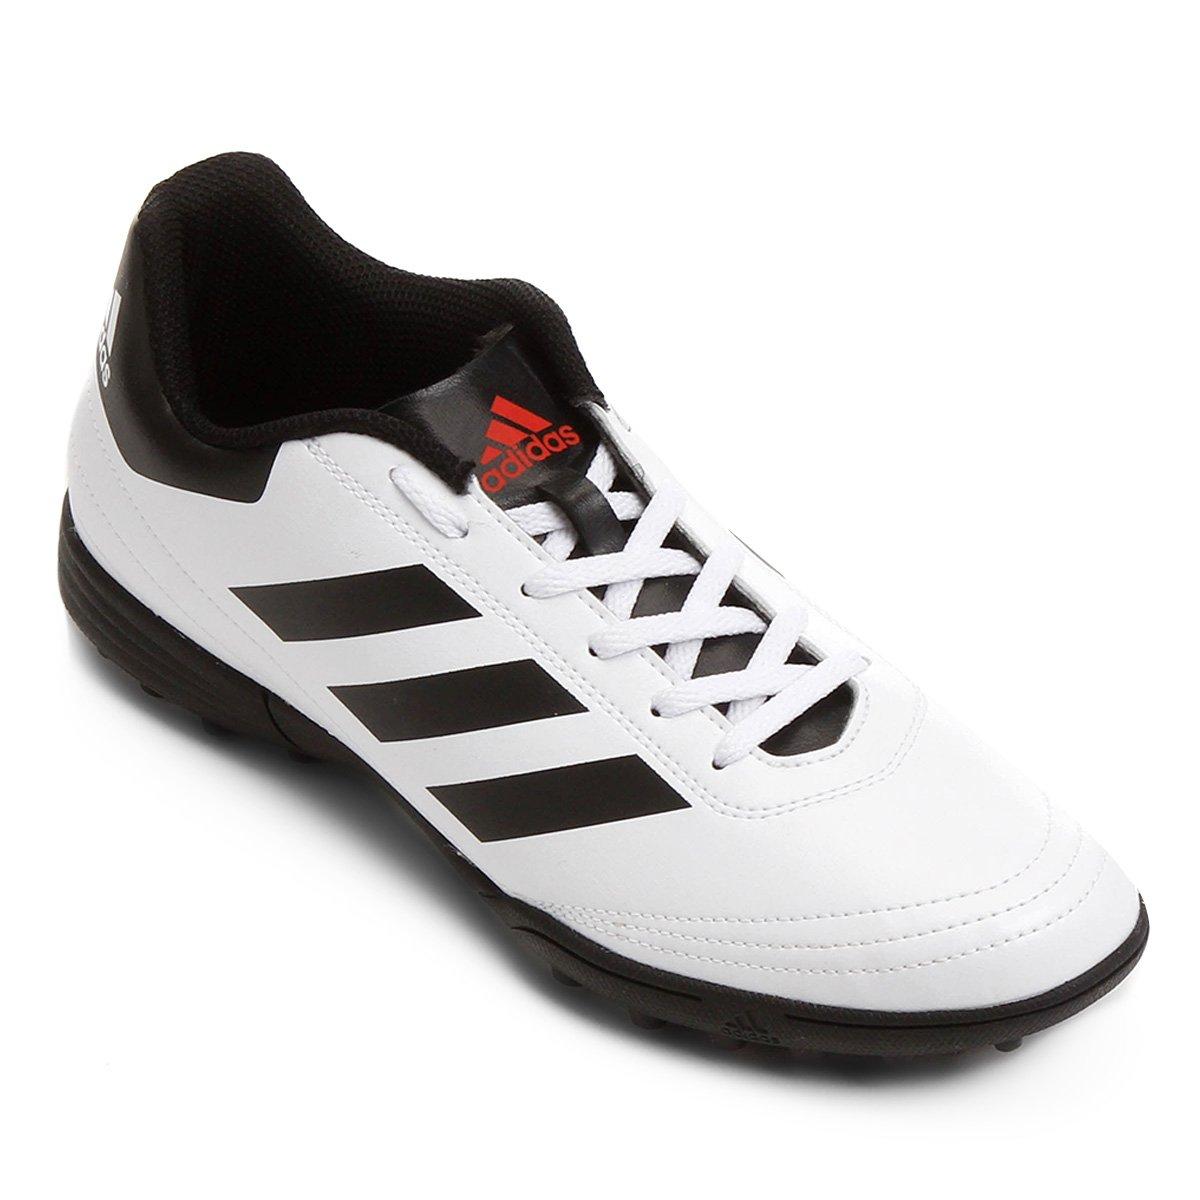 1c53dd1b5dd62 Chuteira Society Adidas Goletto 6 TF